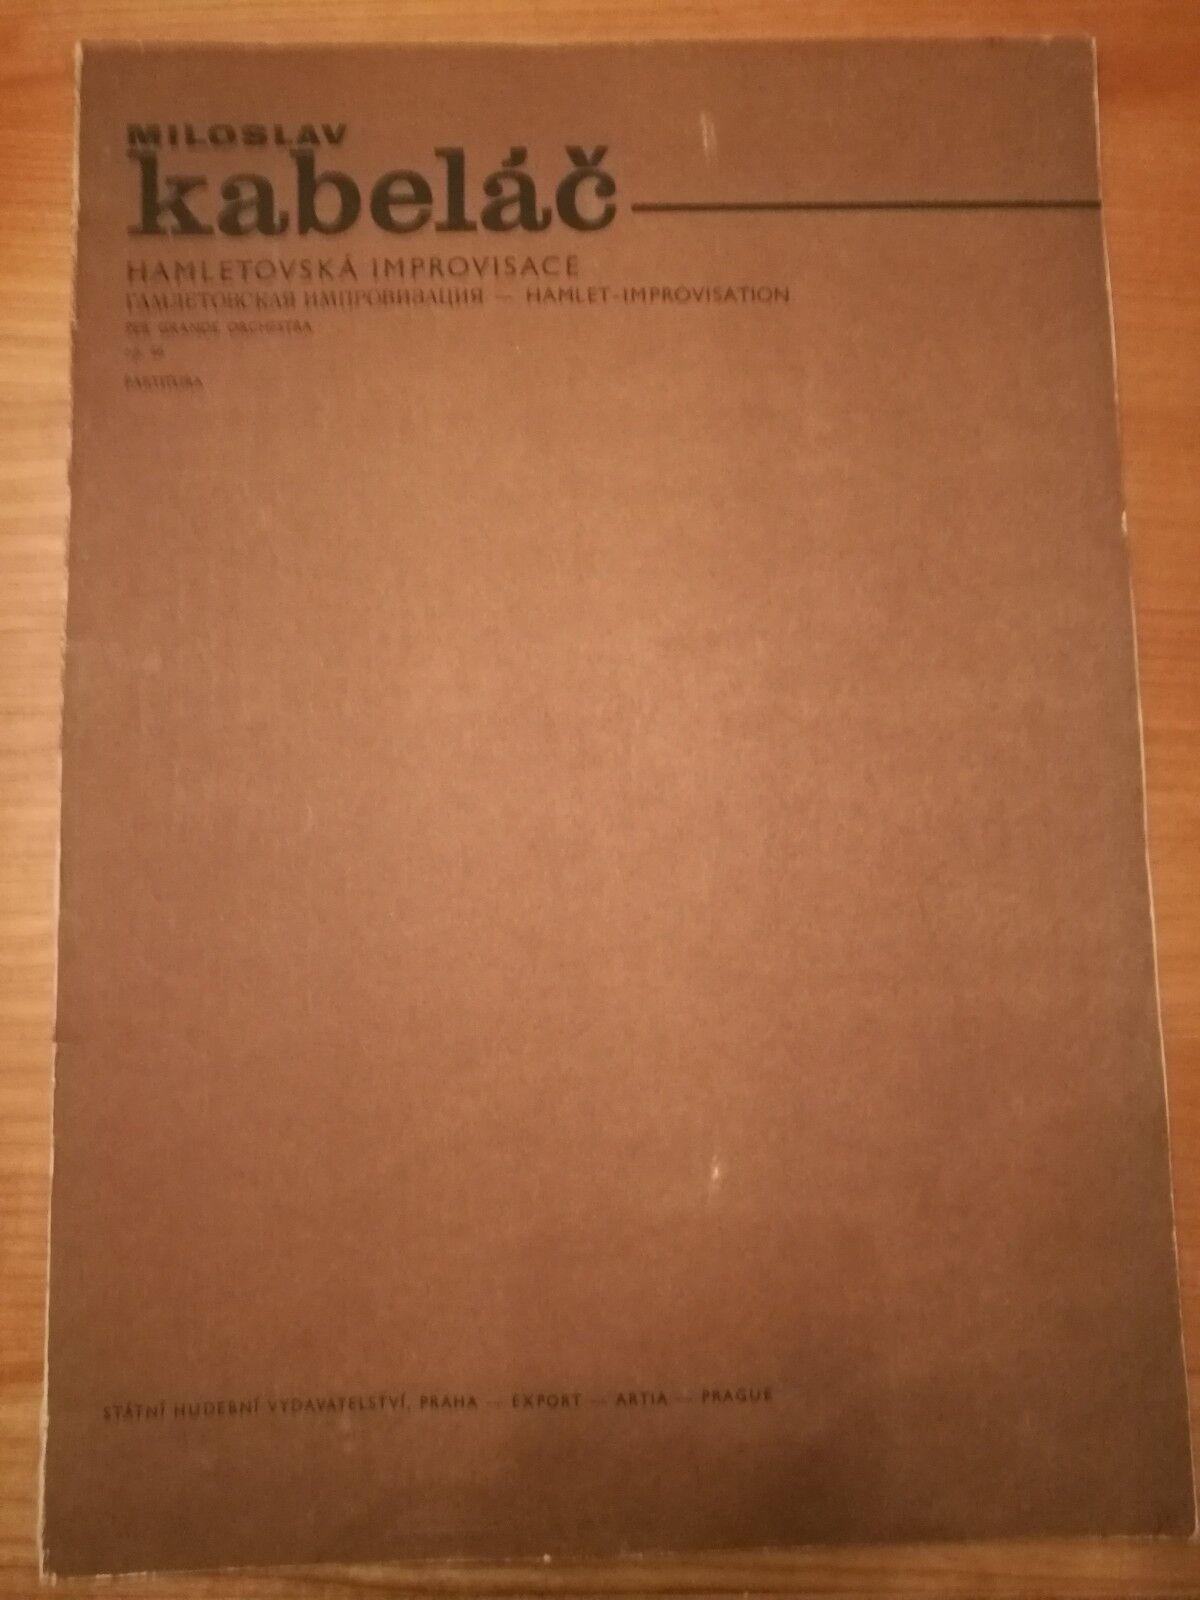 Notas. kabalac. kabalac. kabalac. hamletovska improvisace partituras 46. partitura.  servicio de primera clase